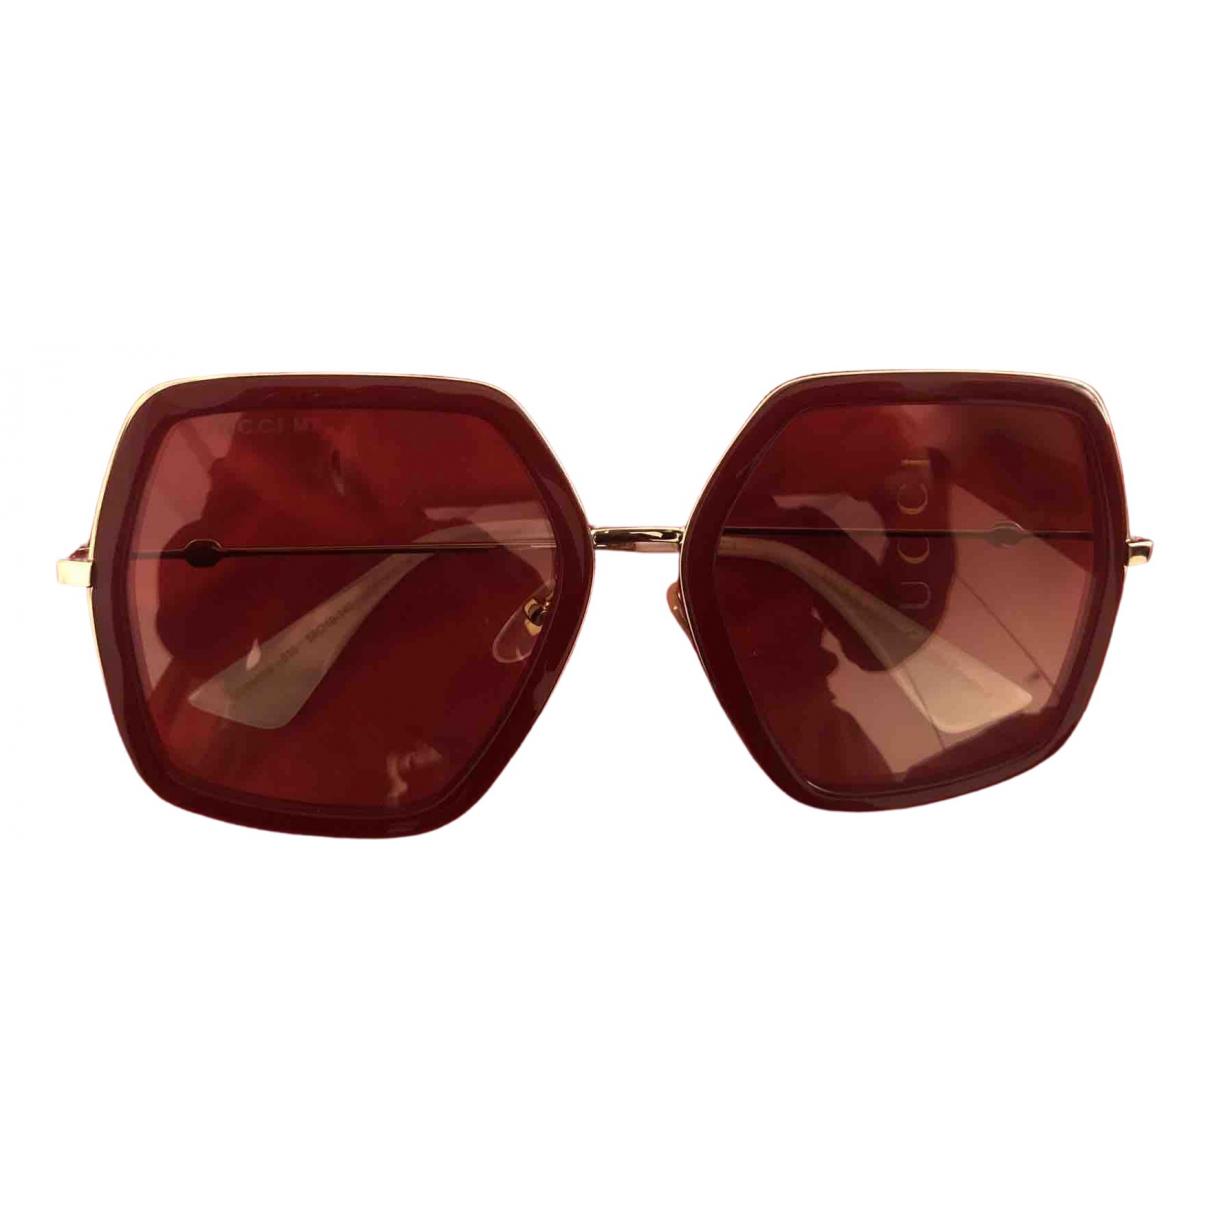 Gucci N Red Metal Sunglasses for Women N